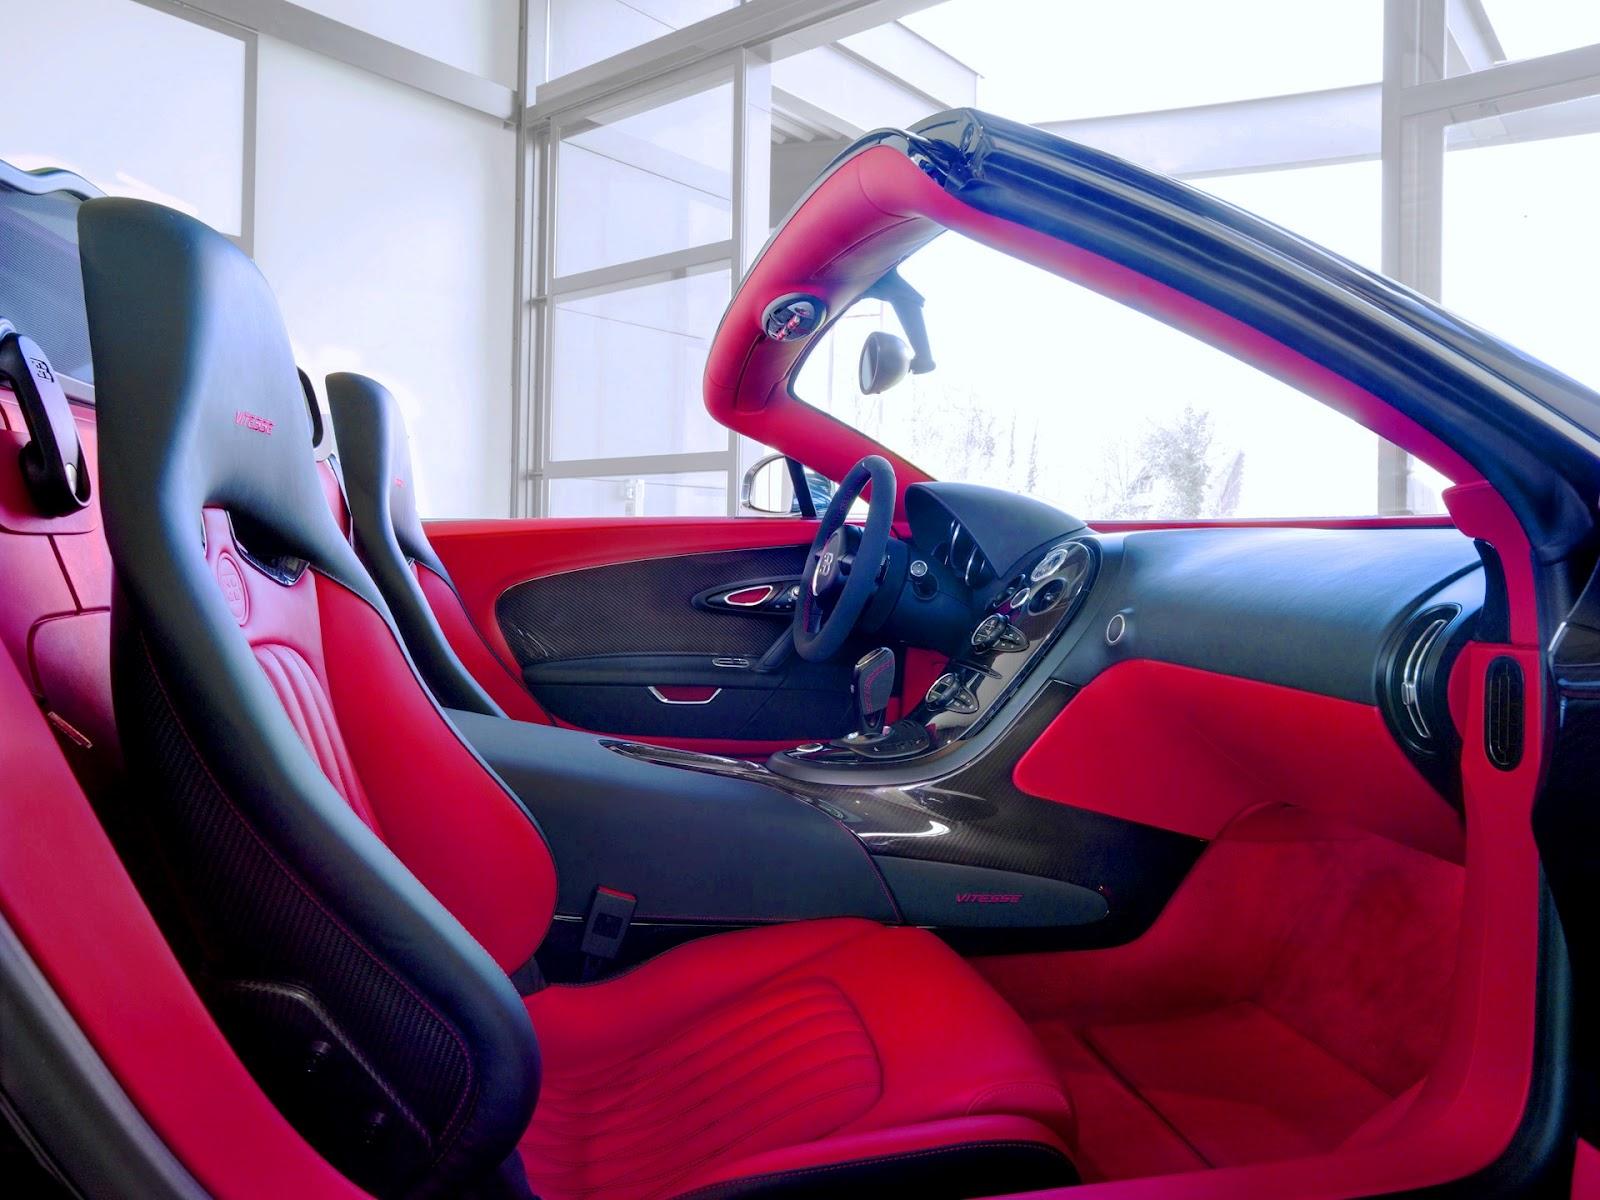 2012-Bugatti-Veyron-Grand-Sport-Vitesse-Black-and-Red-Interior-1920x1440 Fabulous 2012 Bugatti Veyron Grand Sport Vitesse Specs Cars Trend